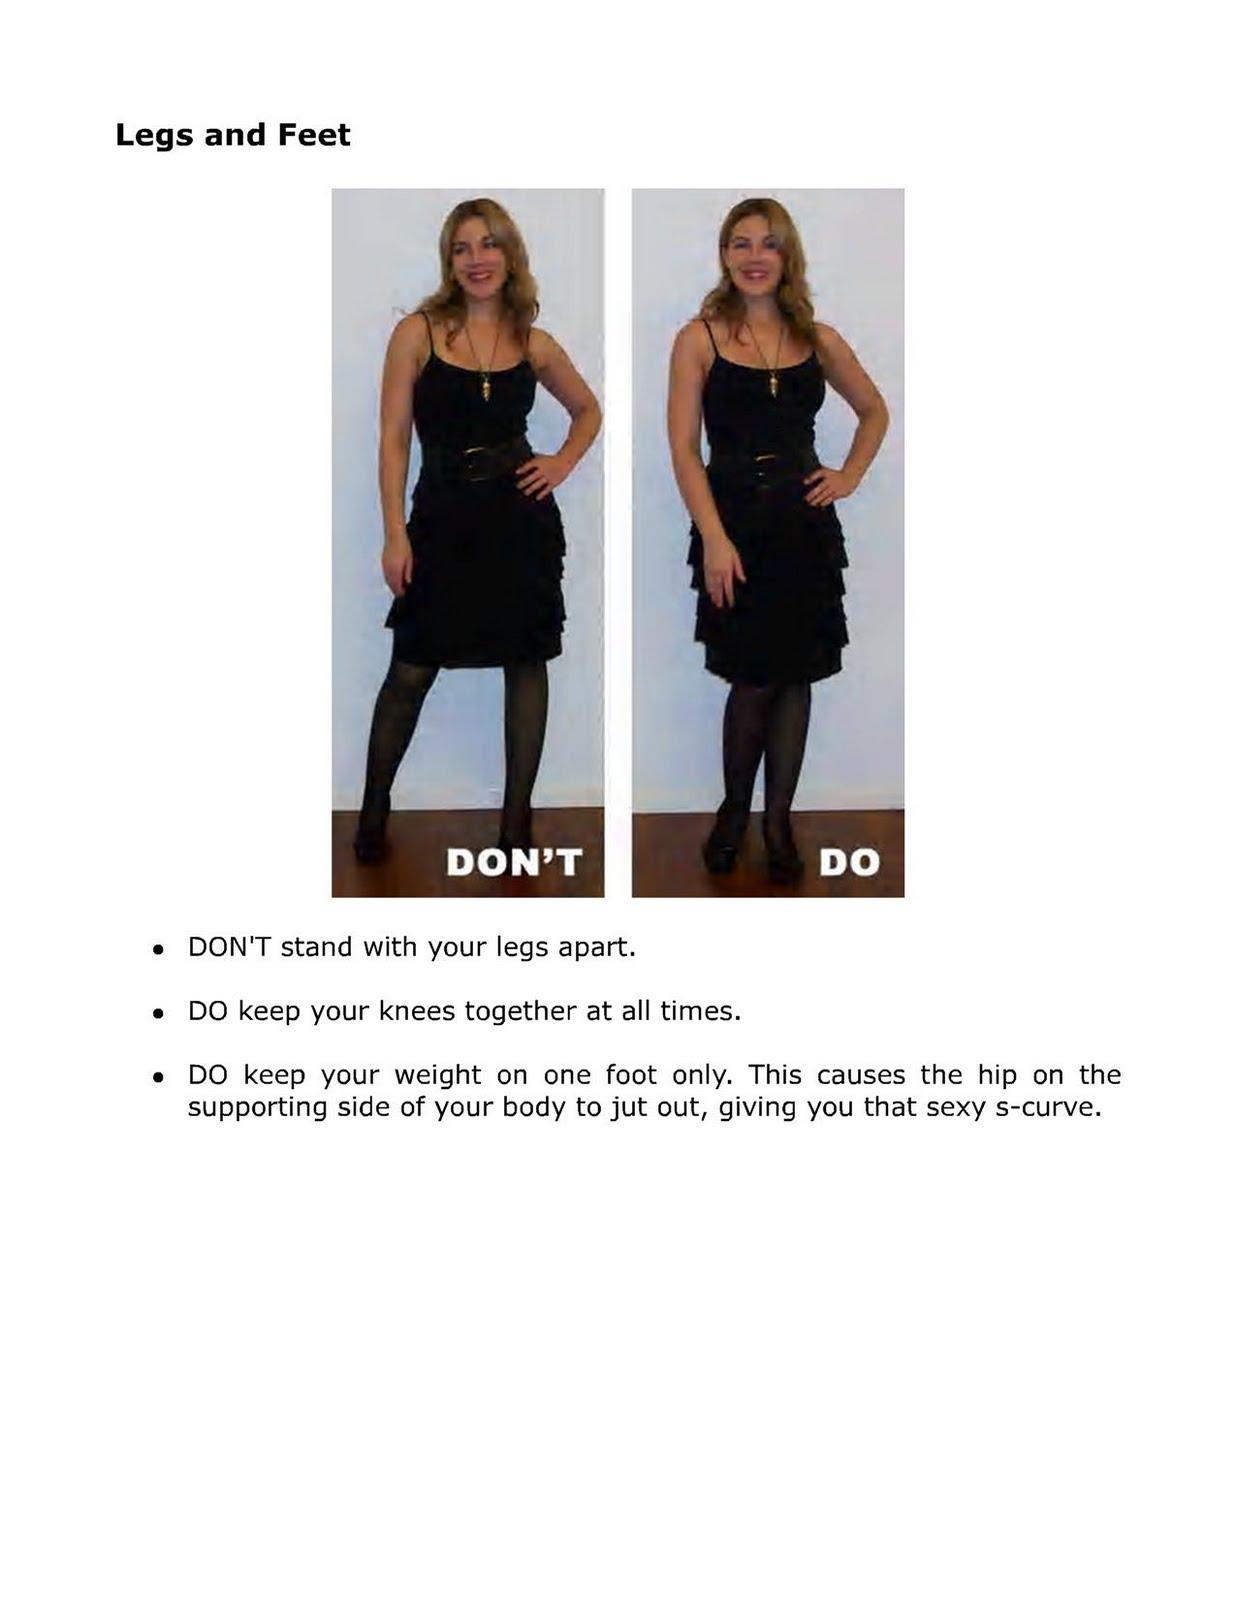 Crossdressing tips female body language secrets - Tips dressing ...